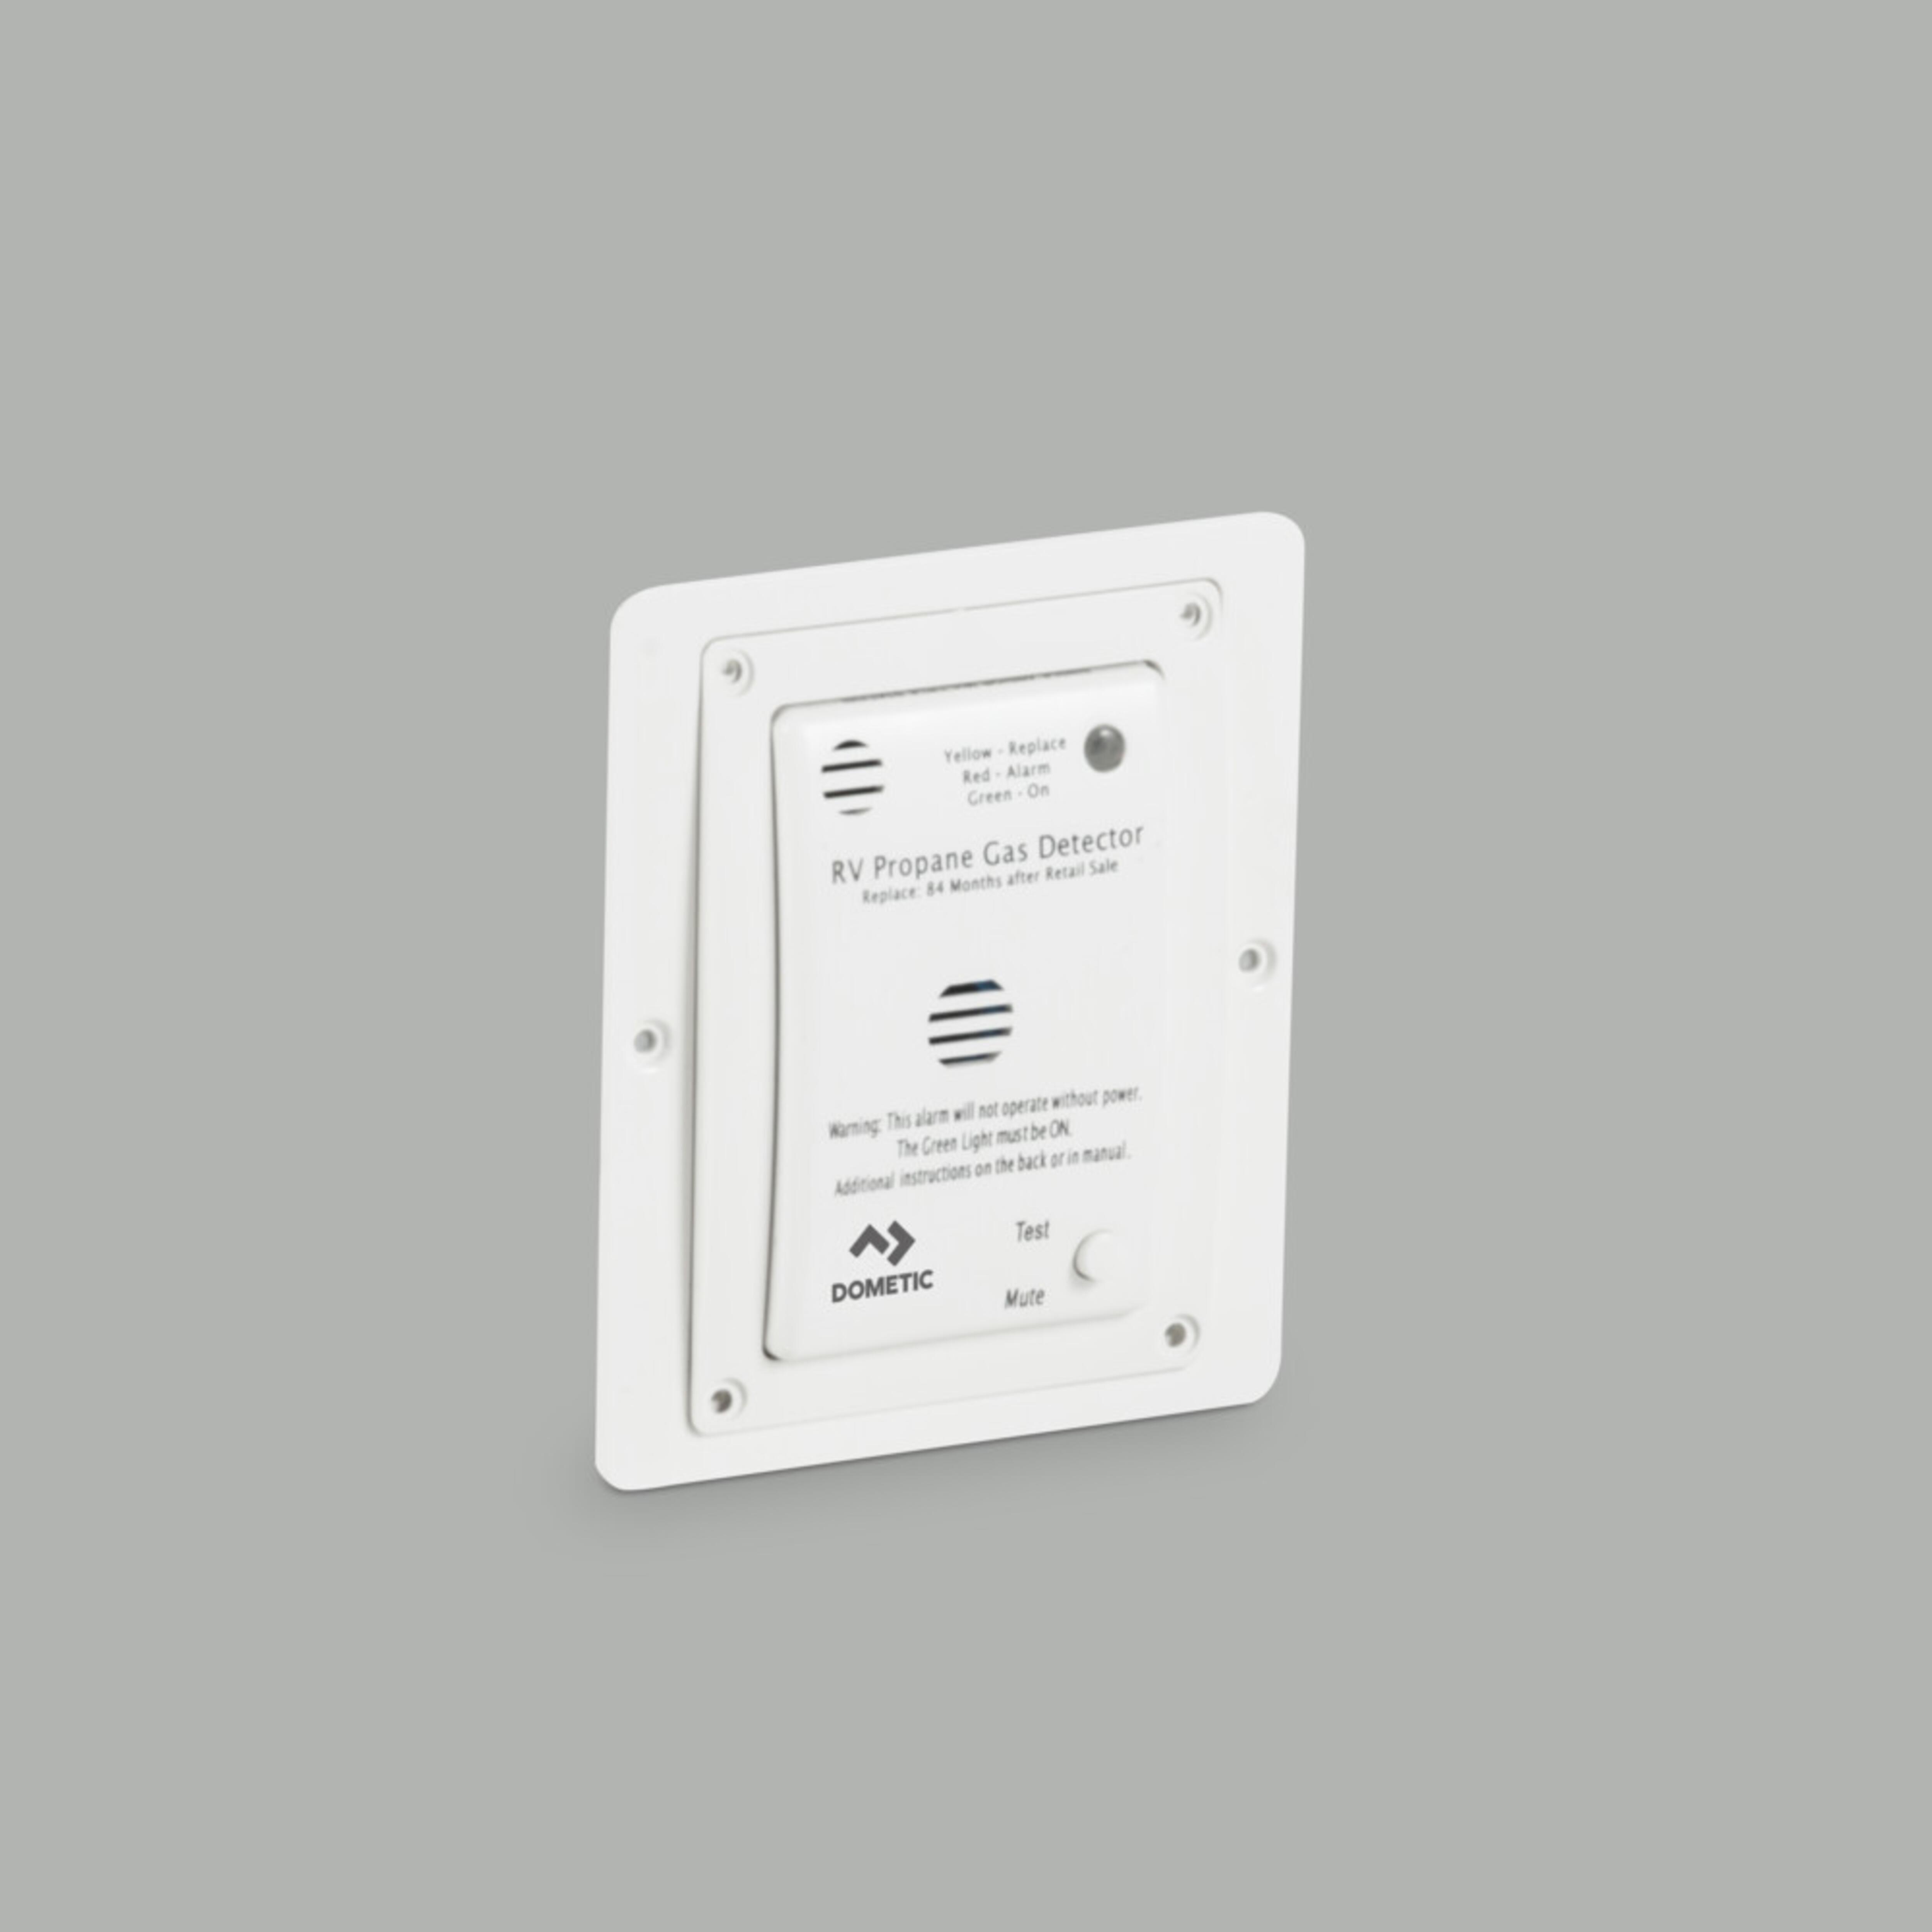 Dometic LP Gas Detector